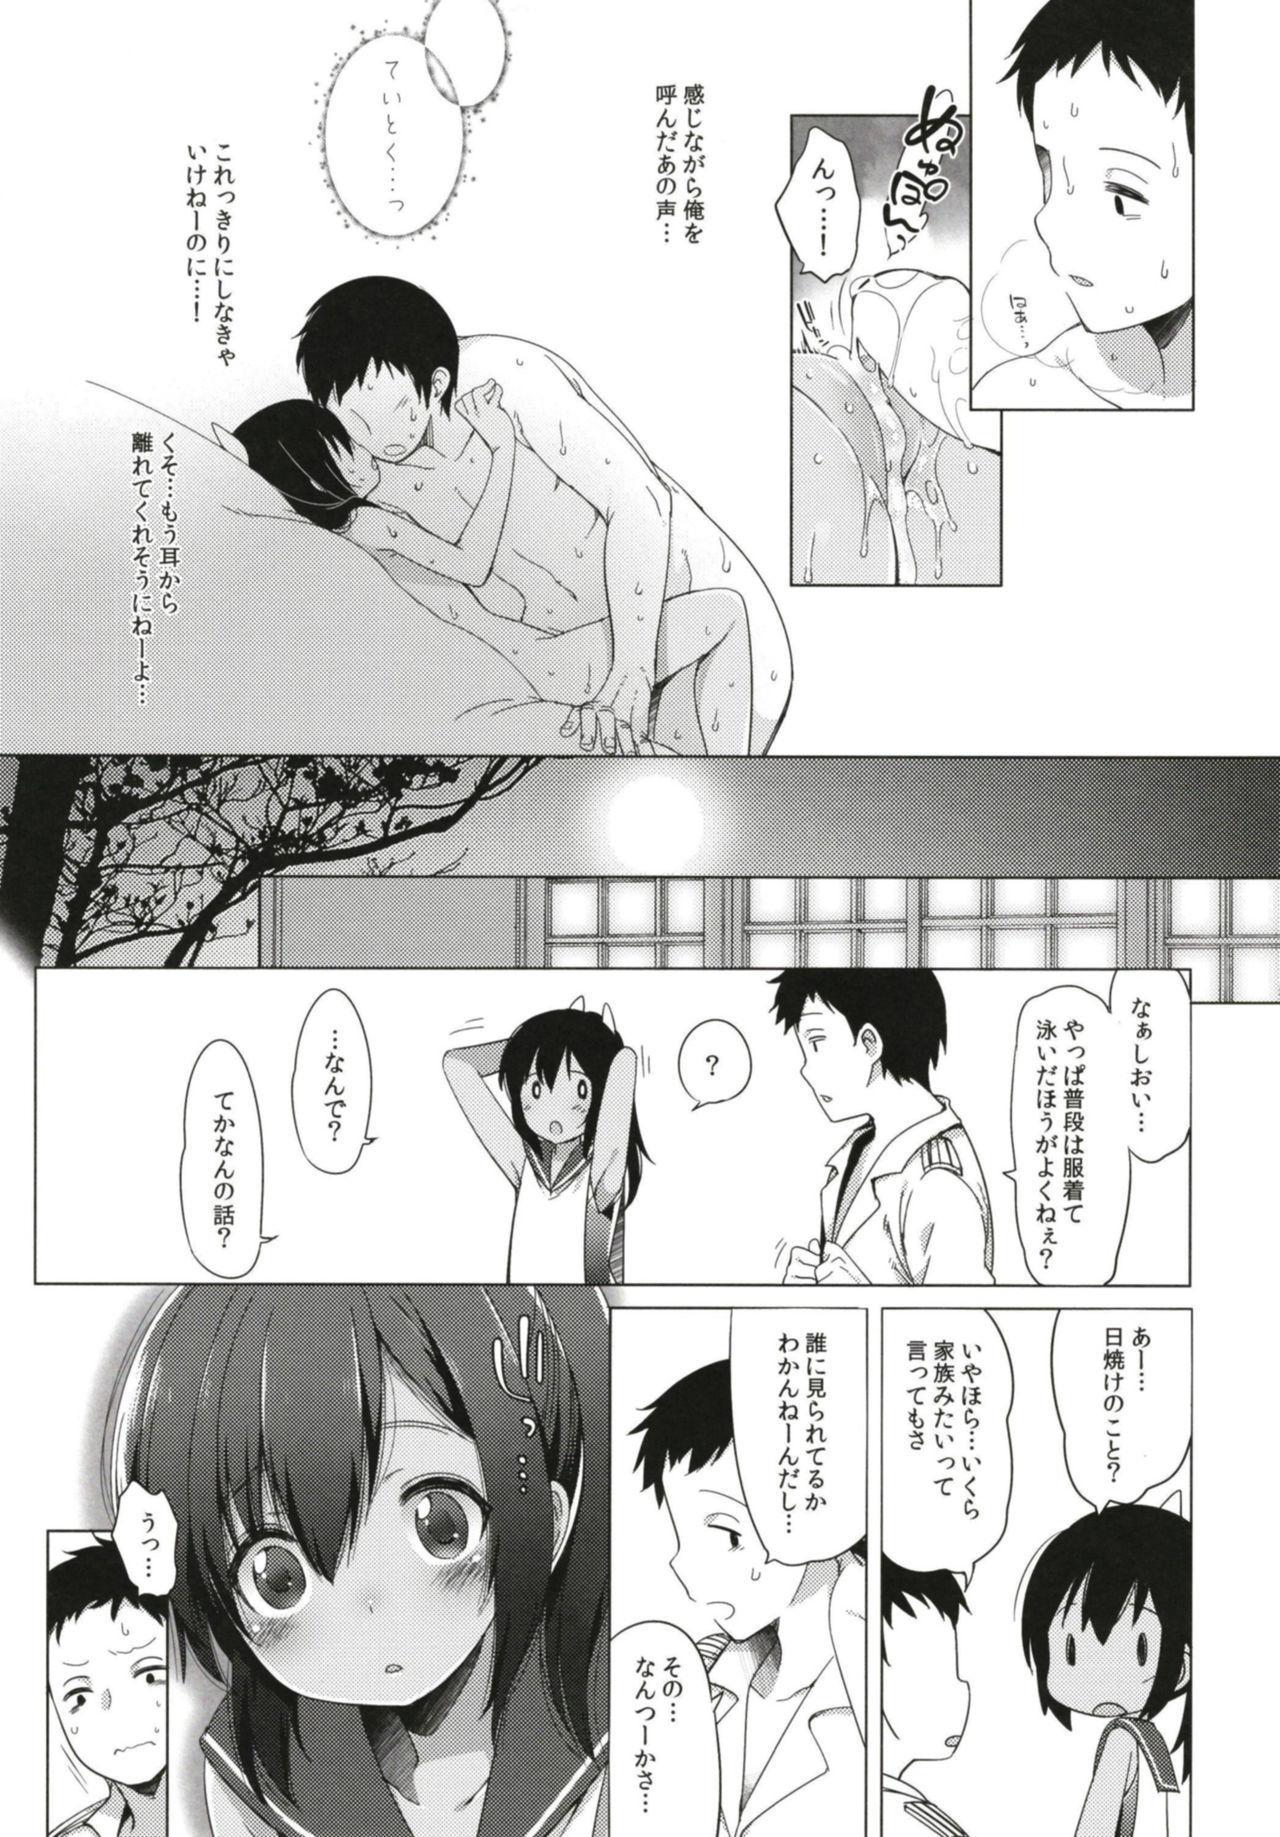 [French letter (Fujisaki Hikari)] Hitonatsu no Ayamachi -I-401 Soushuuhen- (Kantai Collection -KanColle-) [Digital] 20